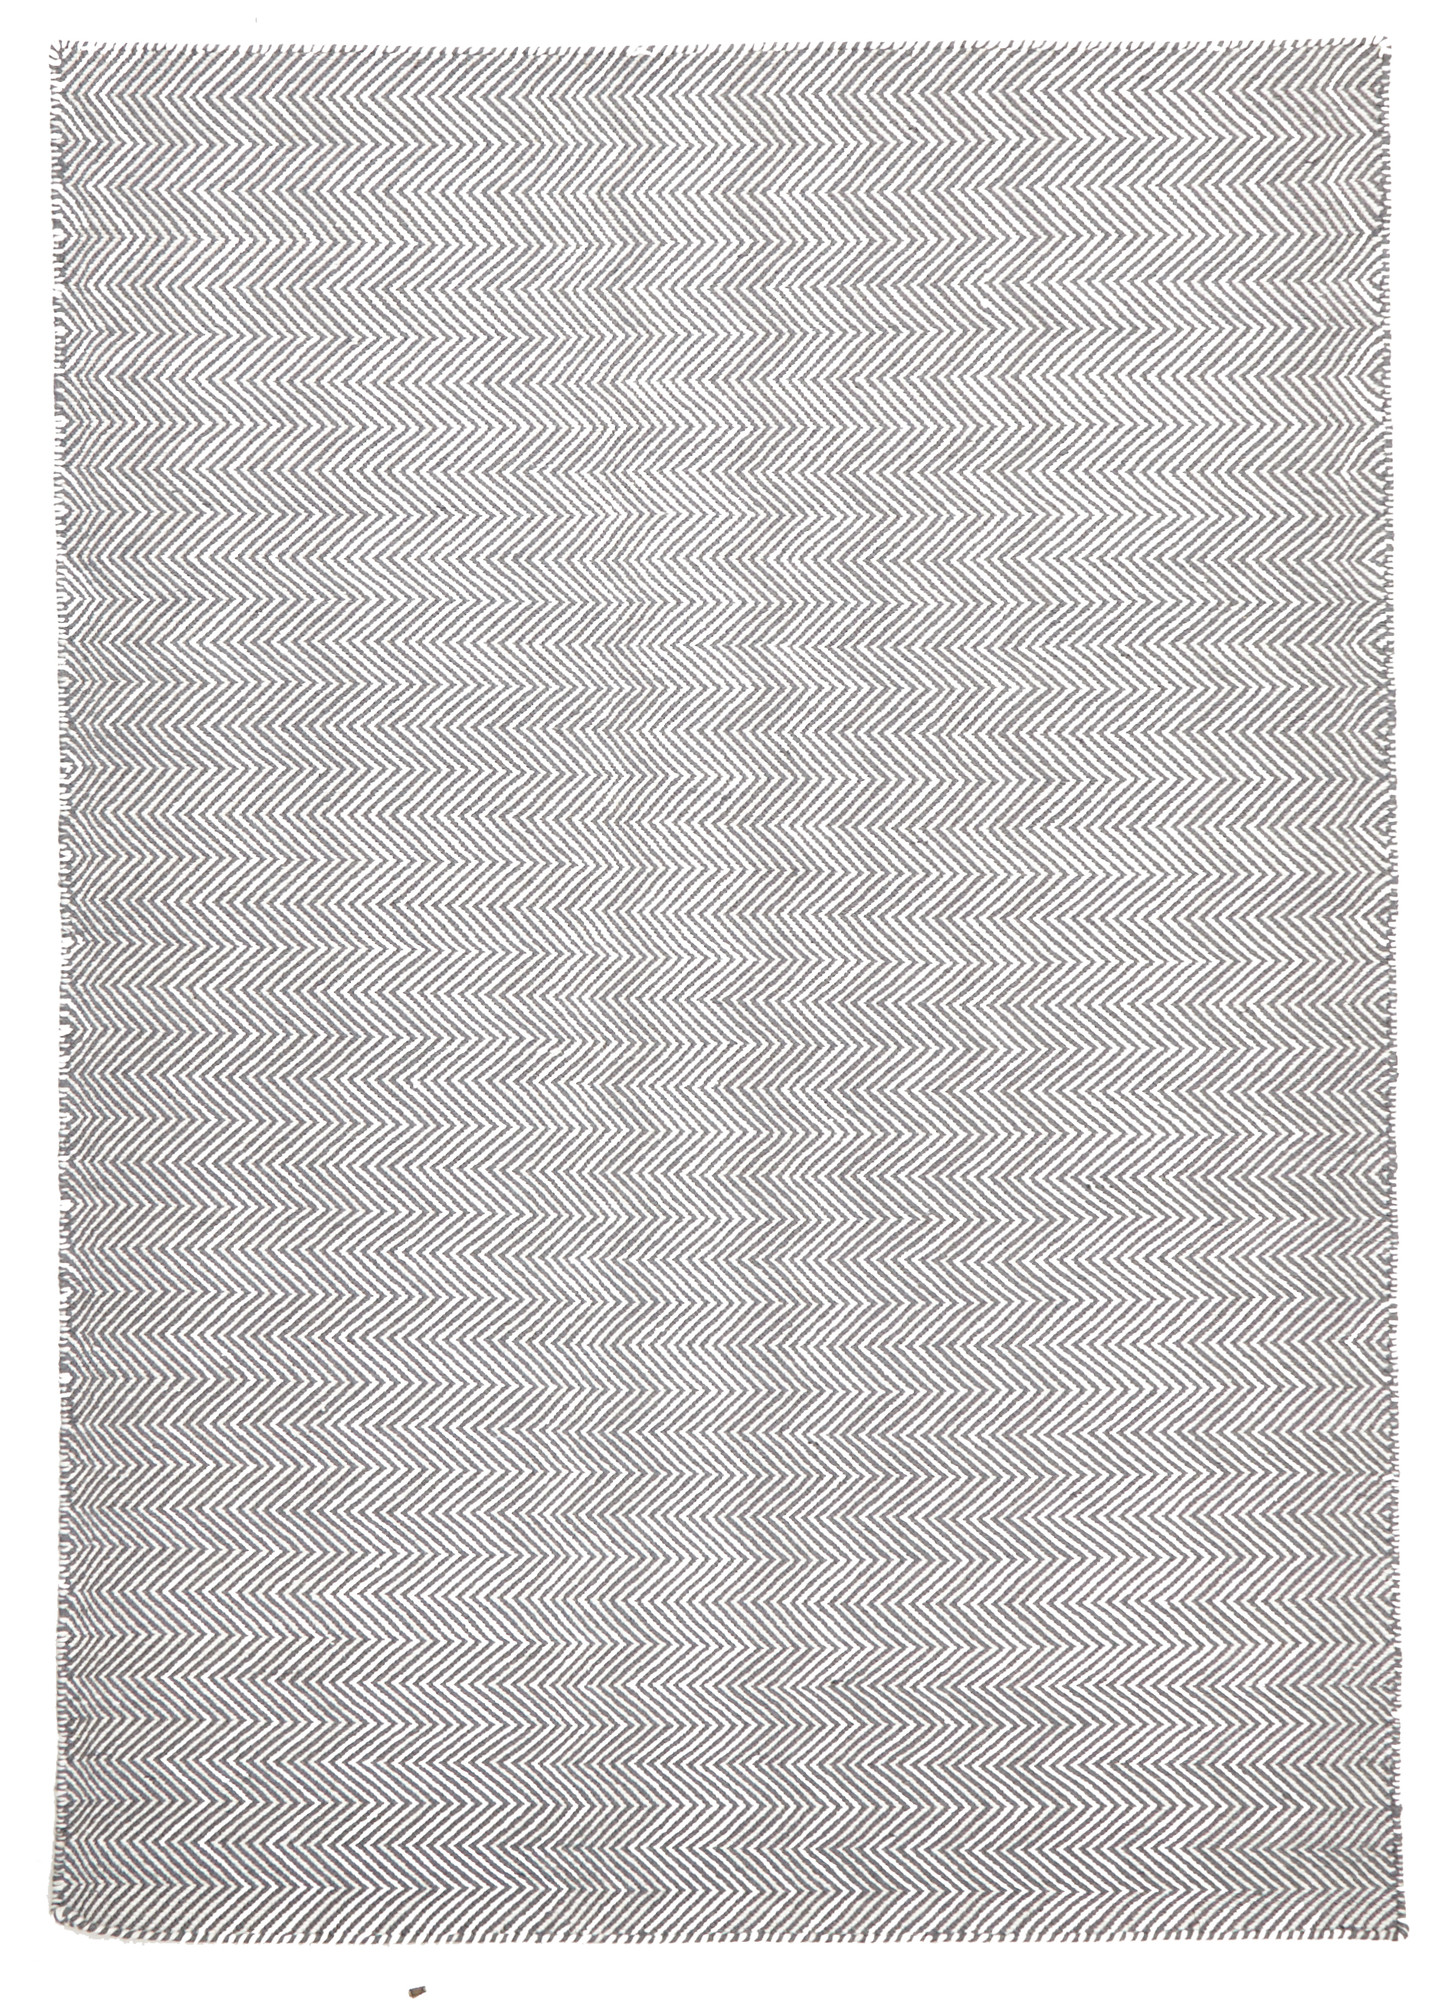 NEW-Herring-Bone-Chevron-Rug-Grey